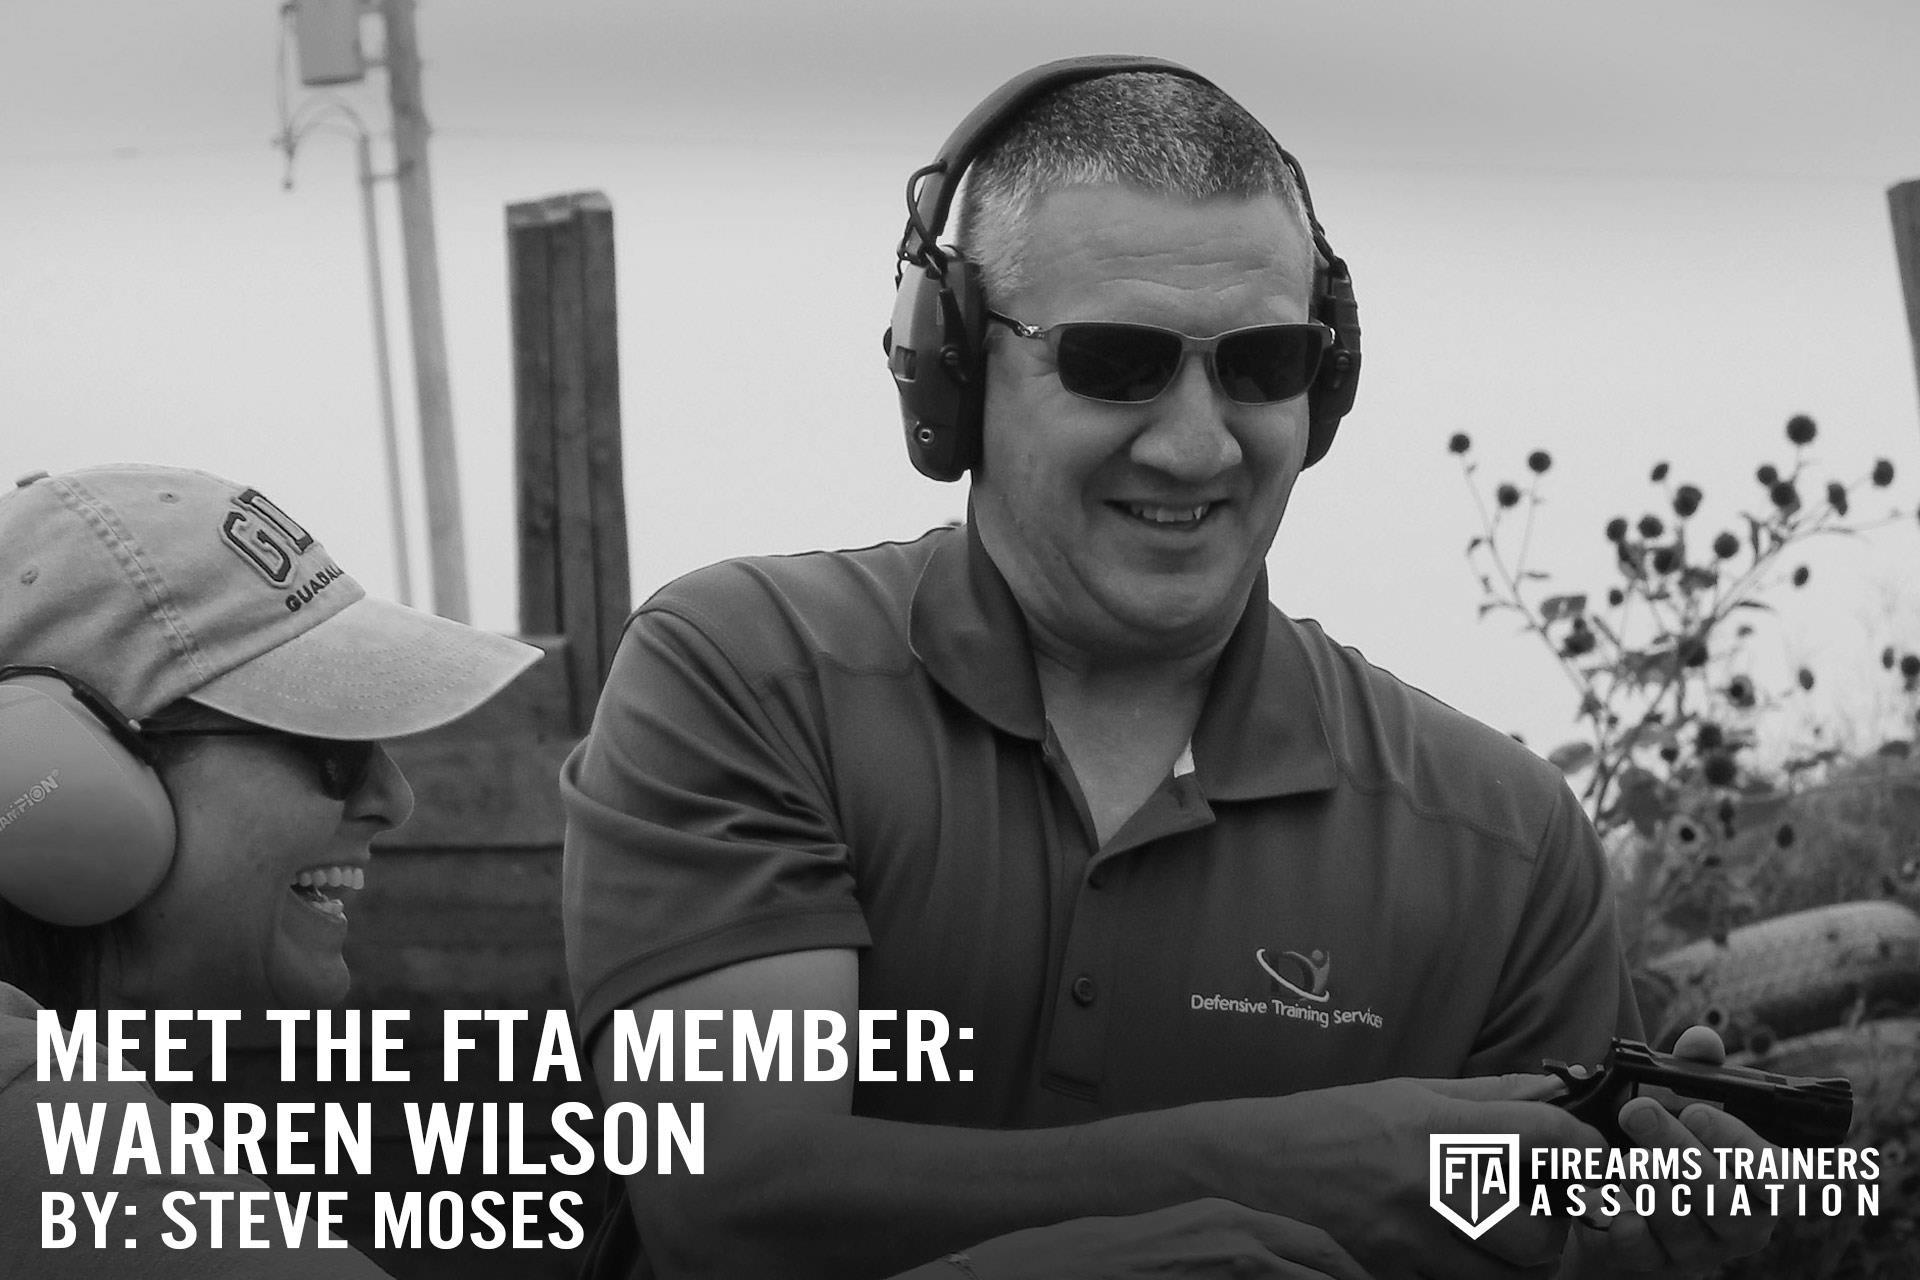 MEET THE FTA MEMBER SERIES: WARREN WILSON